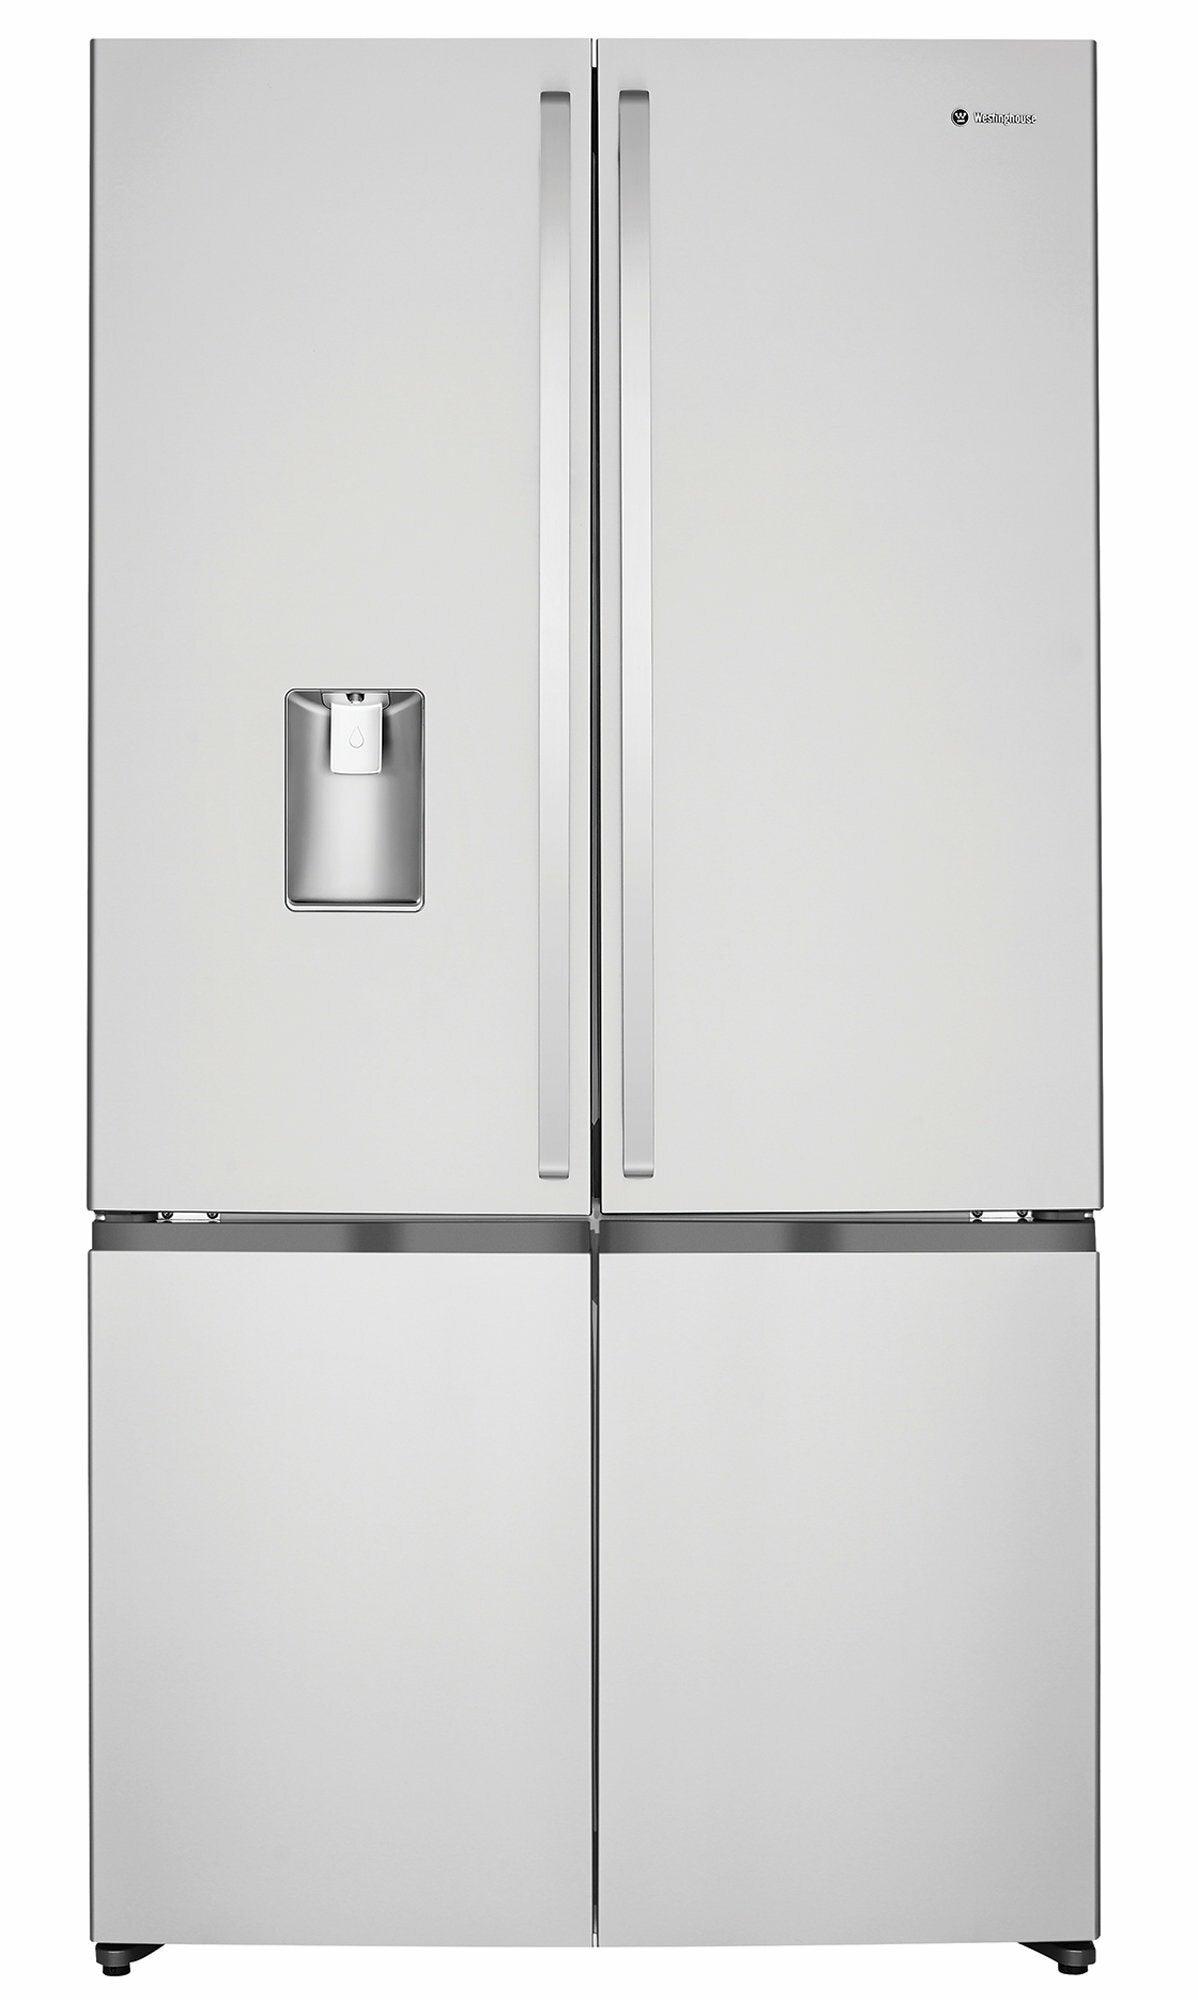 Westinghouse WQE6060SB Refrigerator